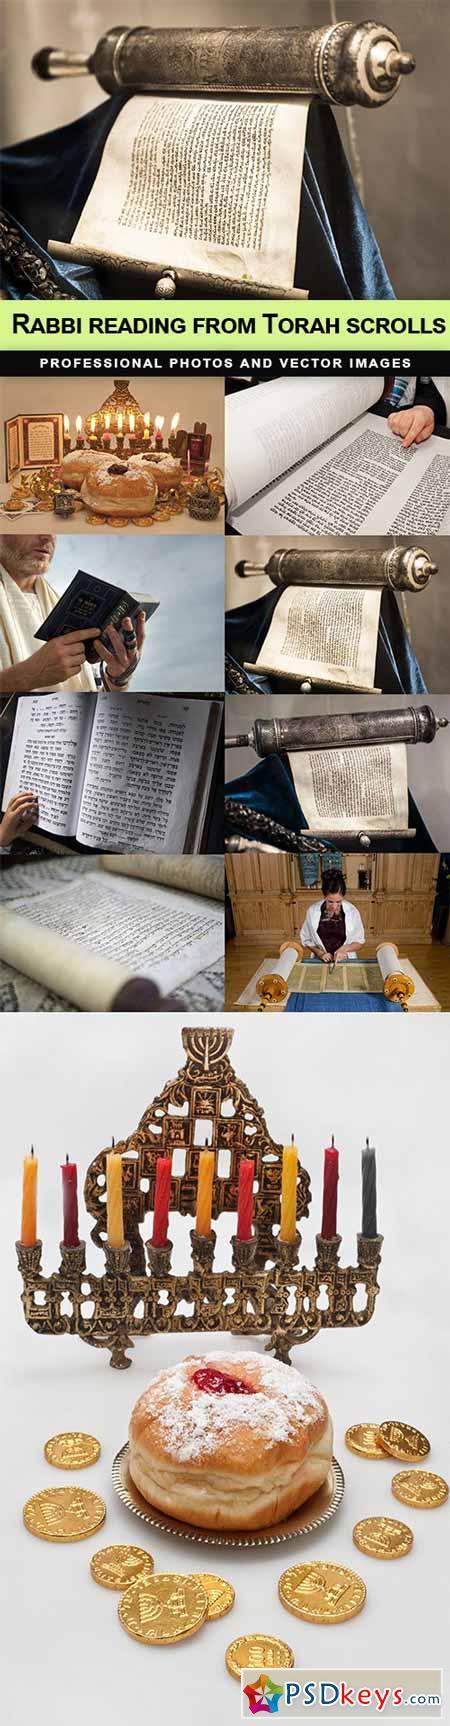 Rabbi reading from Torah scrolls